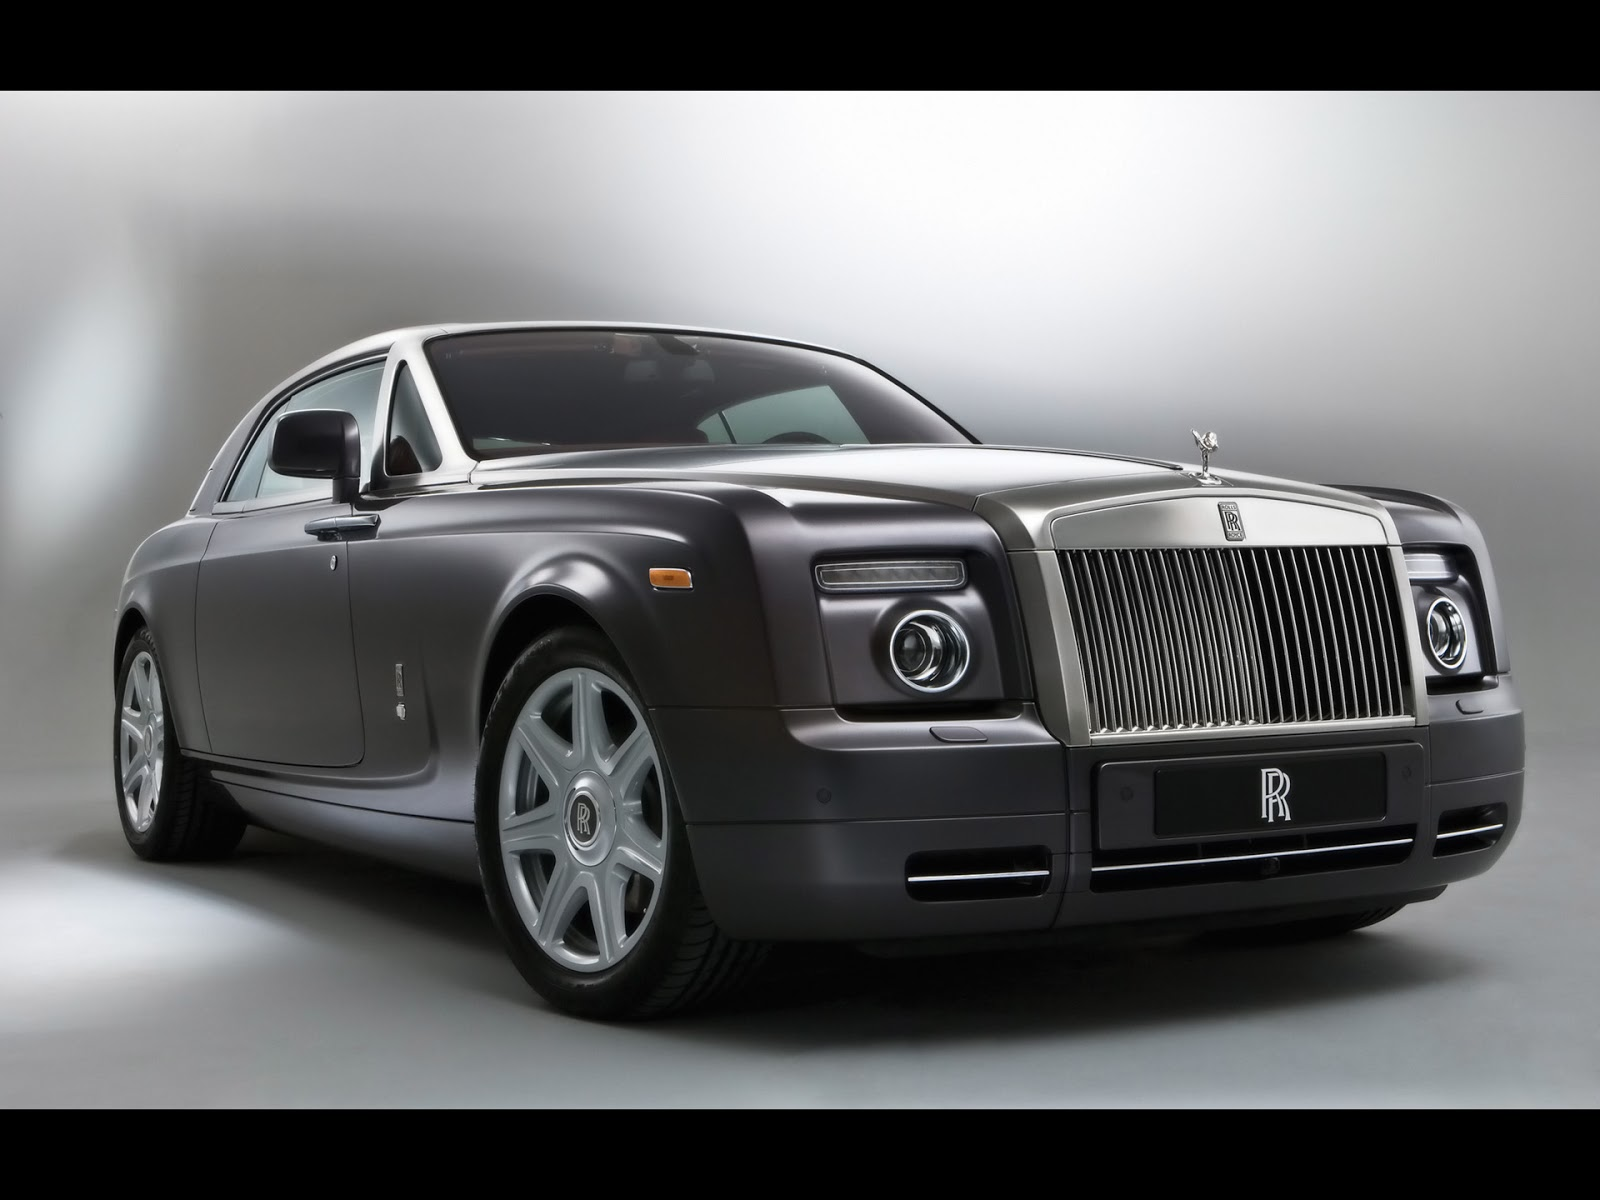 Rolls Royce Phantom Information And Wallpaper